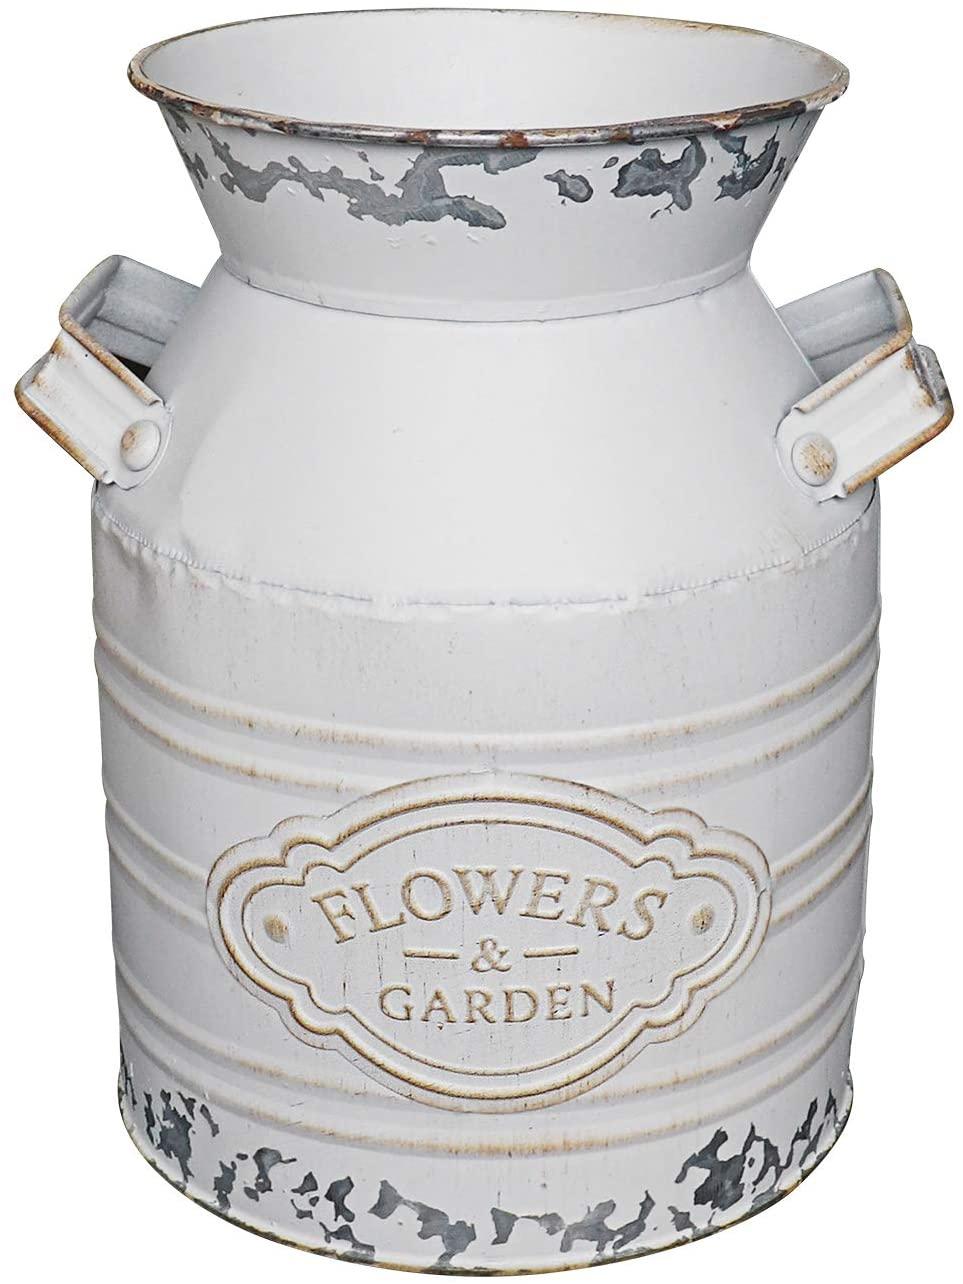 Soyizom Rustic Galvanized Vase Tin Milk Can Vintage White Jug Metal Shabby Chic Bucket Vase Decorative Jug Pot Farmhouse Decor Flower Pitcher for Country Primitive Water Jug Can Decor Vase—Small,7.9